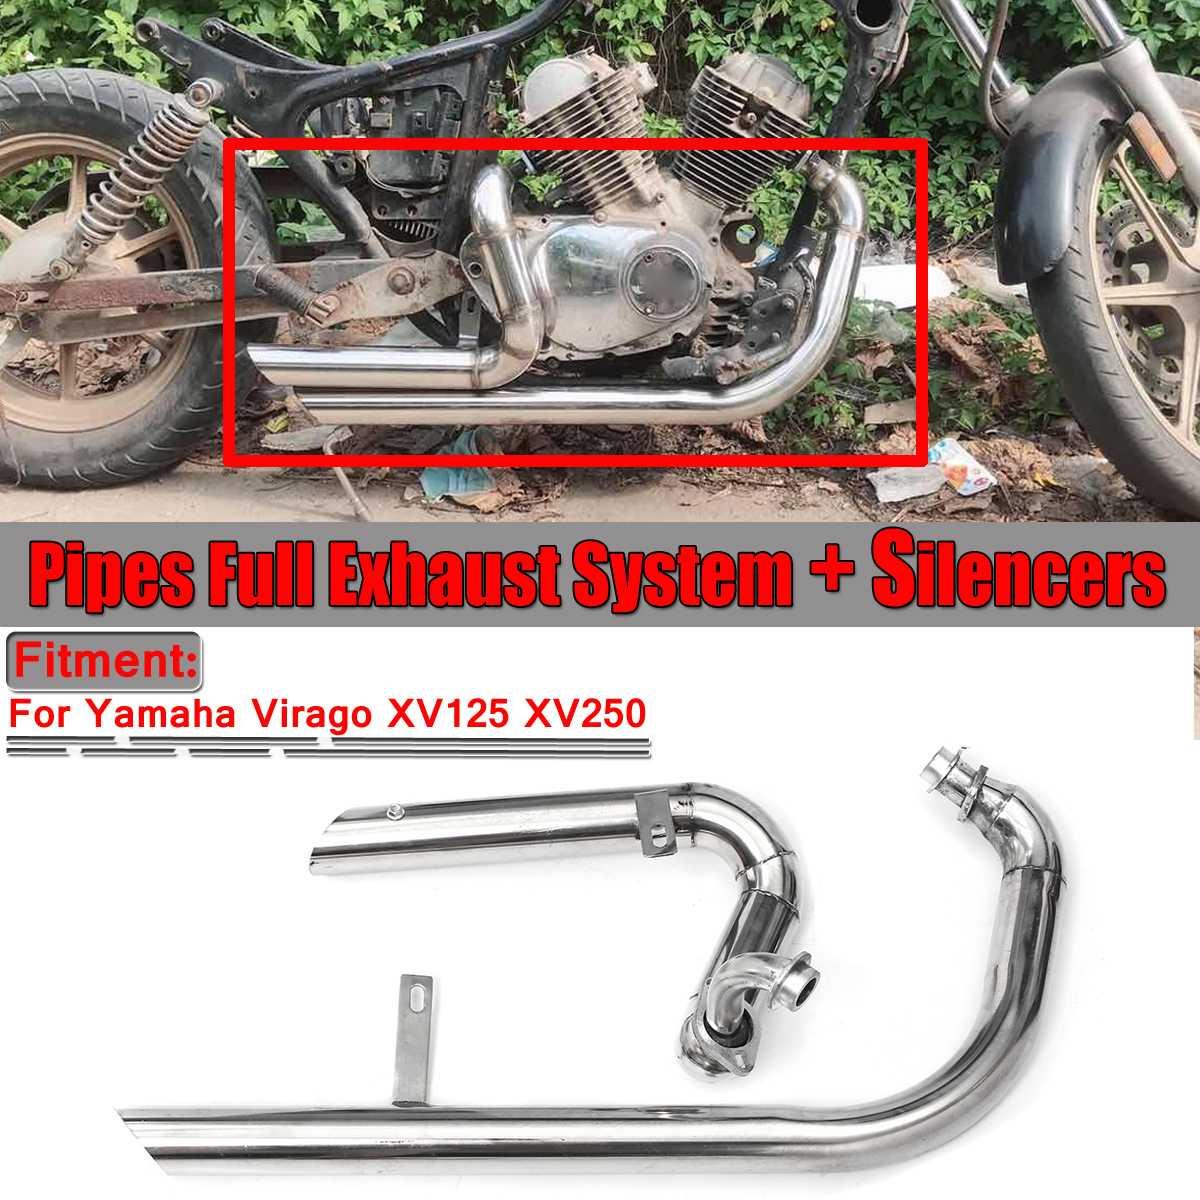 Tuyau d'échappement de moto plein silencieux système d'échappement tuyau + silencieux en acier inoxydable pour Yamaha Virago V Star XV125 XV 125 XV250 XV 250